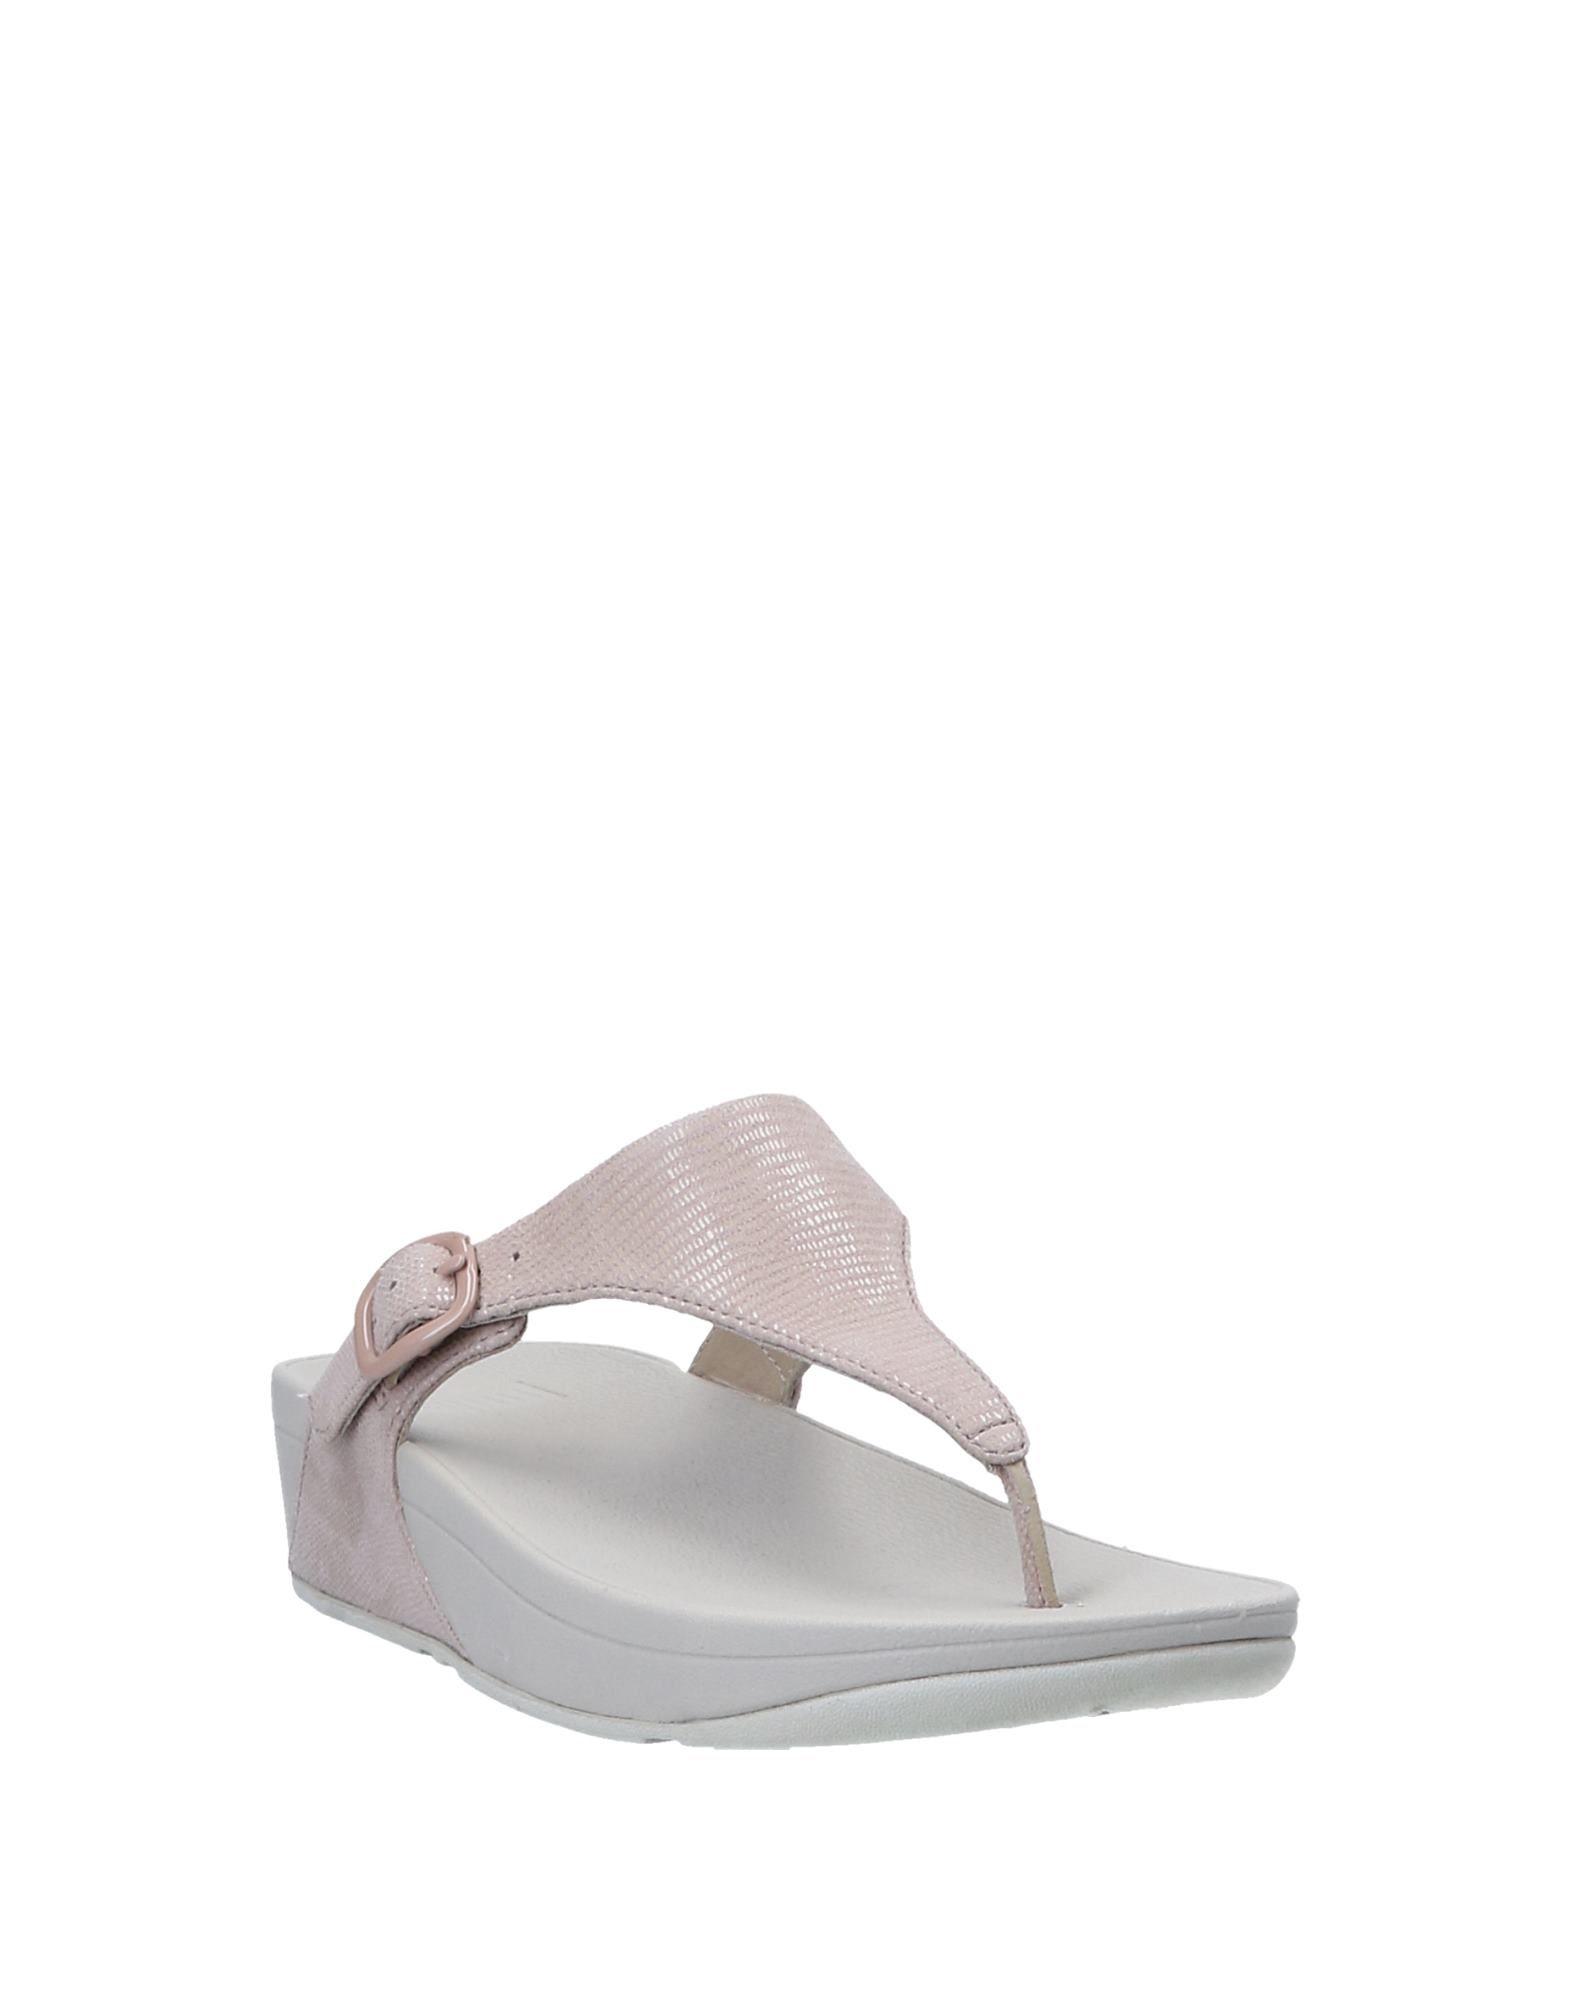 Fitflop 11549206TN Dianetten Damen  11549206TN Fitflop Gute Qualität beliebte Schuhe fc345c